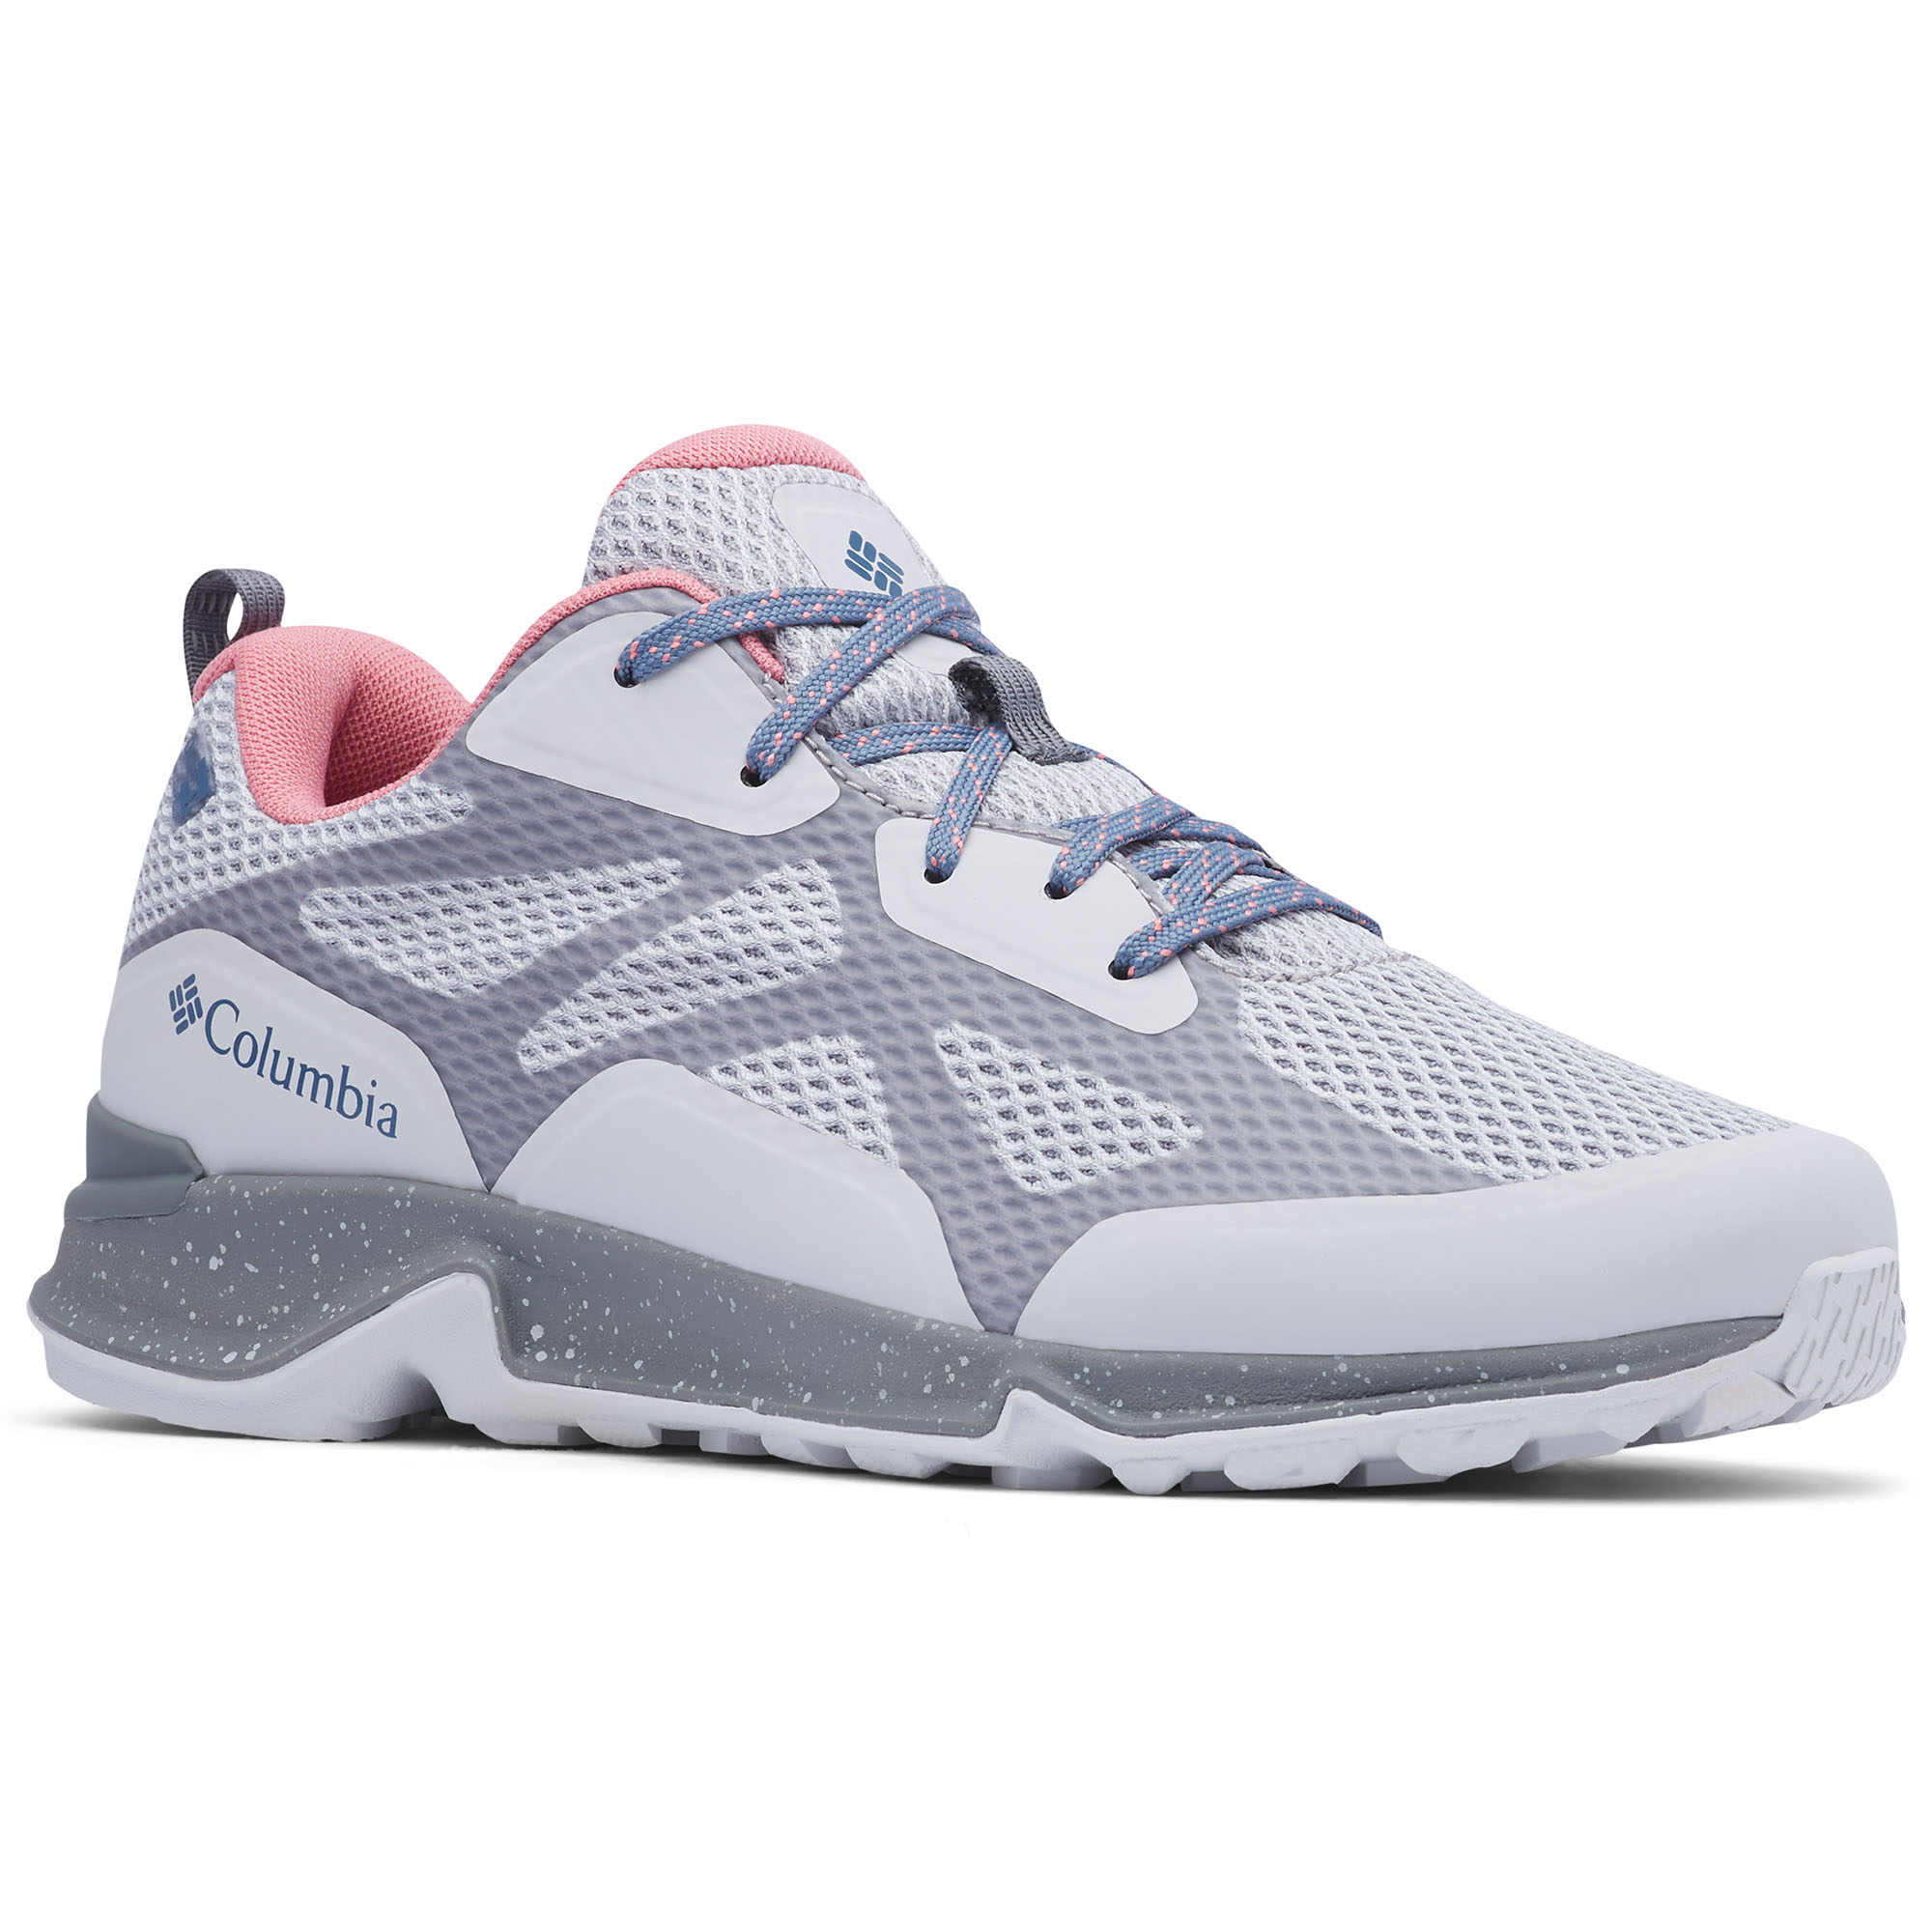 Details about  /Columbia Women/'s Vitesse Outdry Hiking Shoe Choose SZ//color